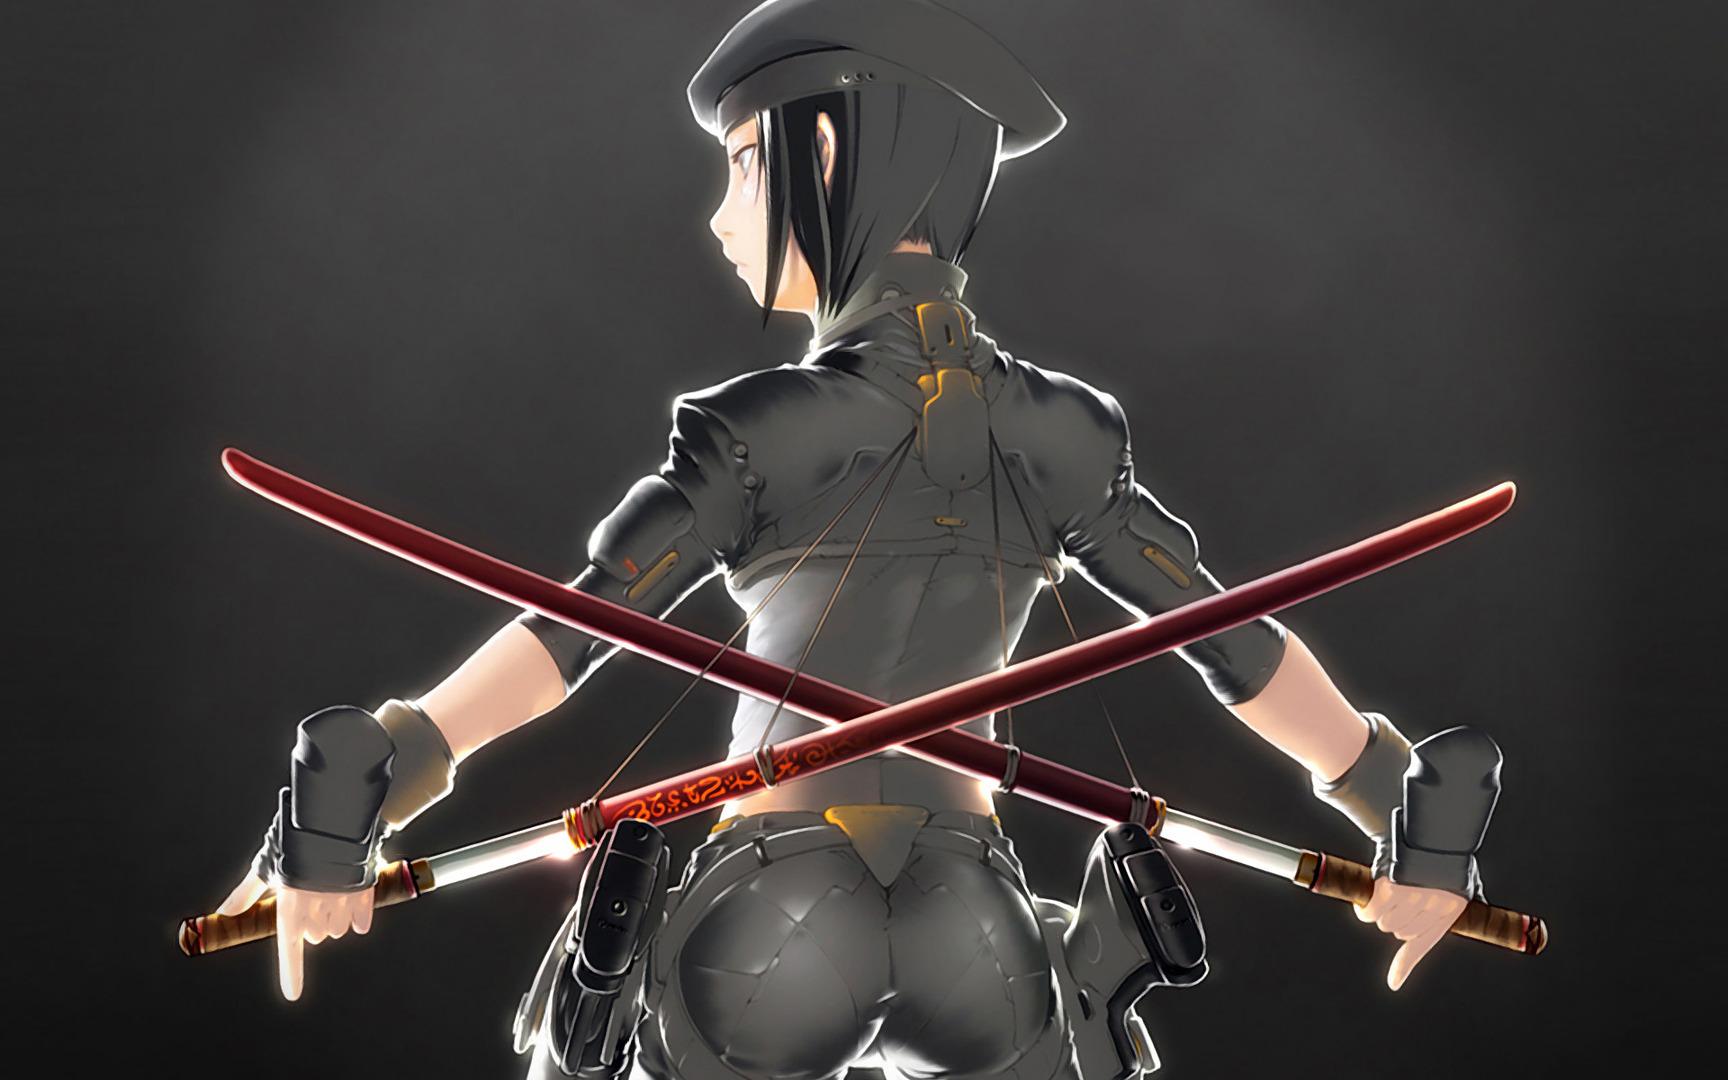 Download Military girl with katana swords wallpaper